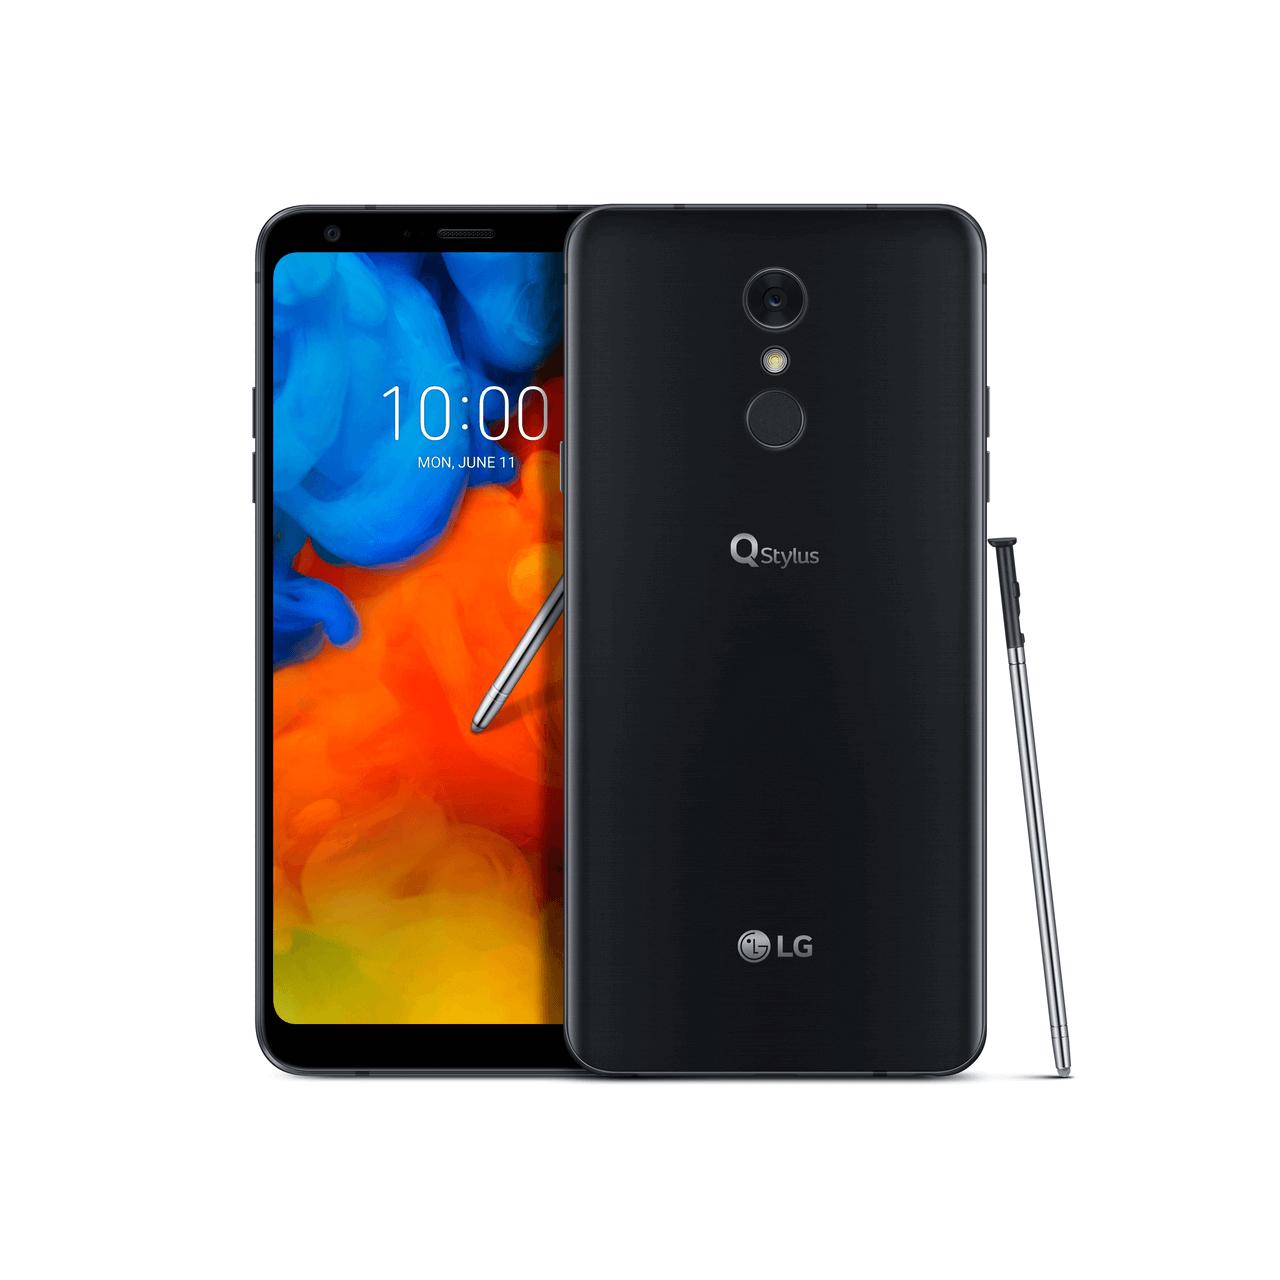 LG Q Stylus Smartphone